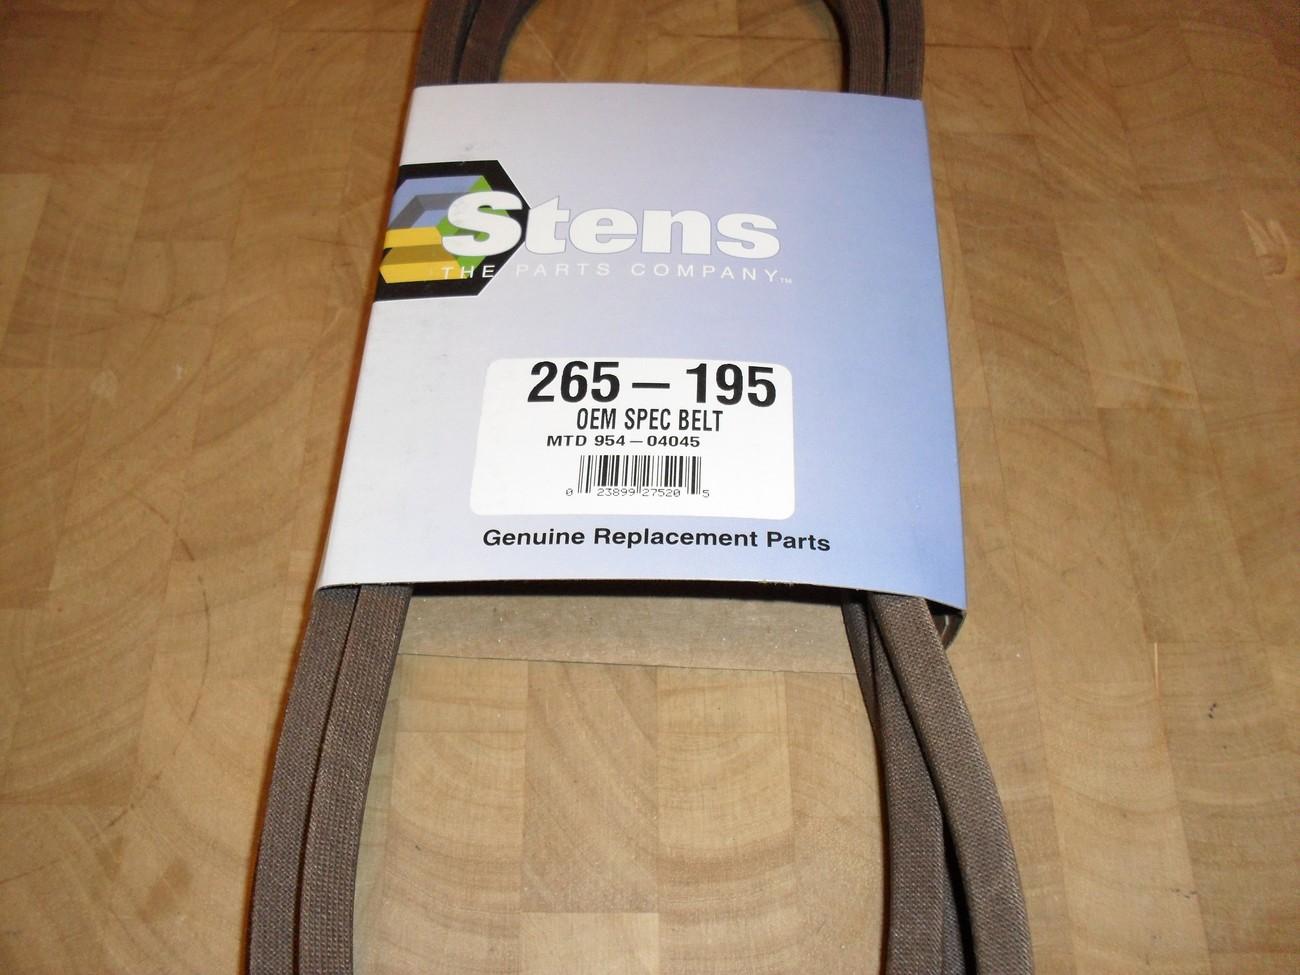 Toro LX420 deck belt 112-5800, 1125800